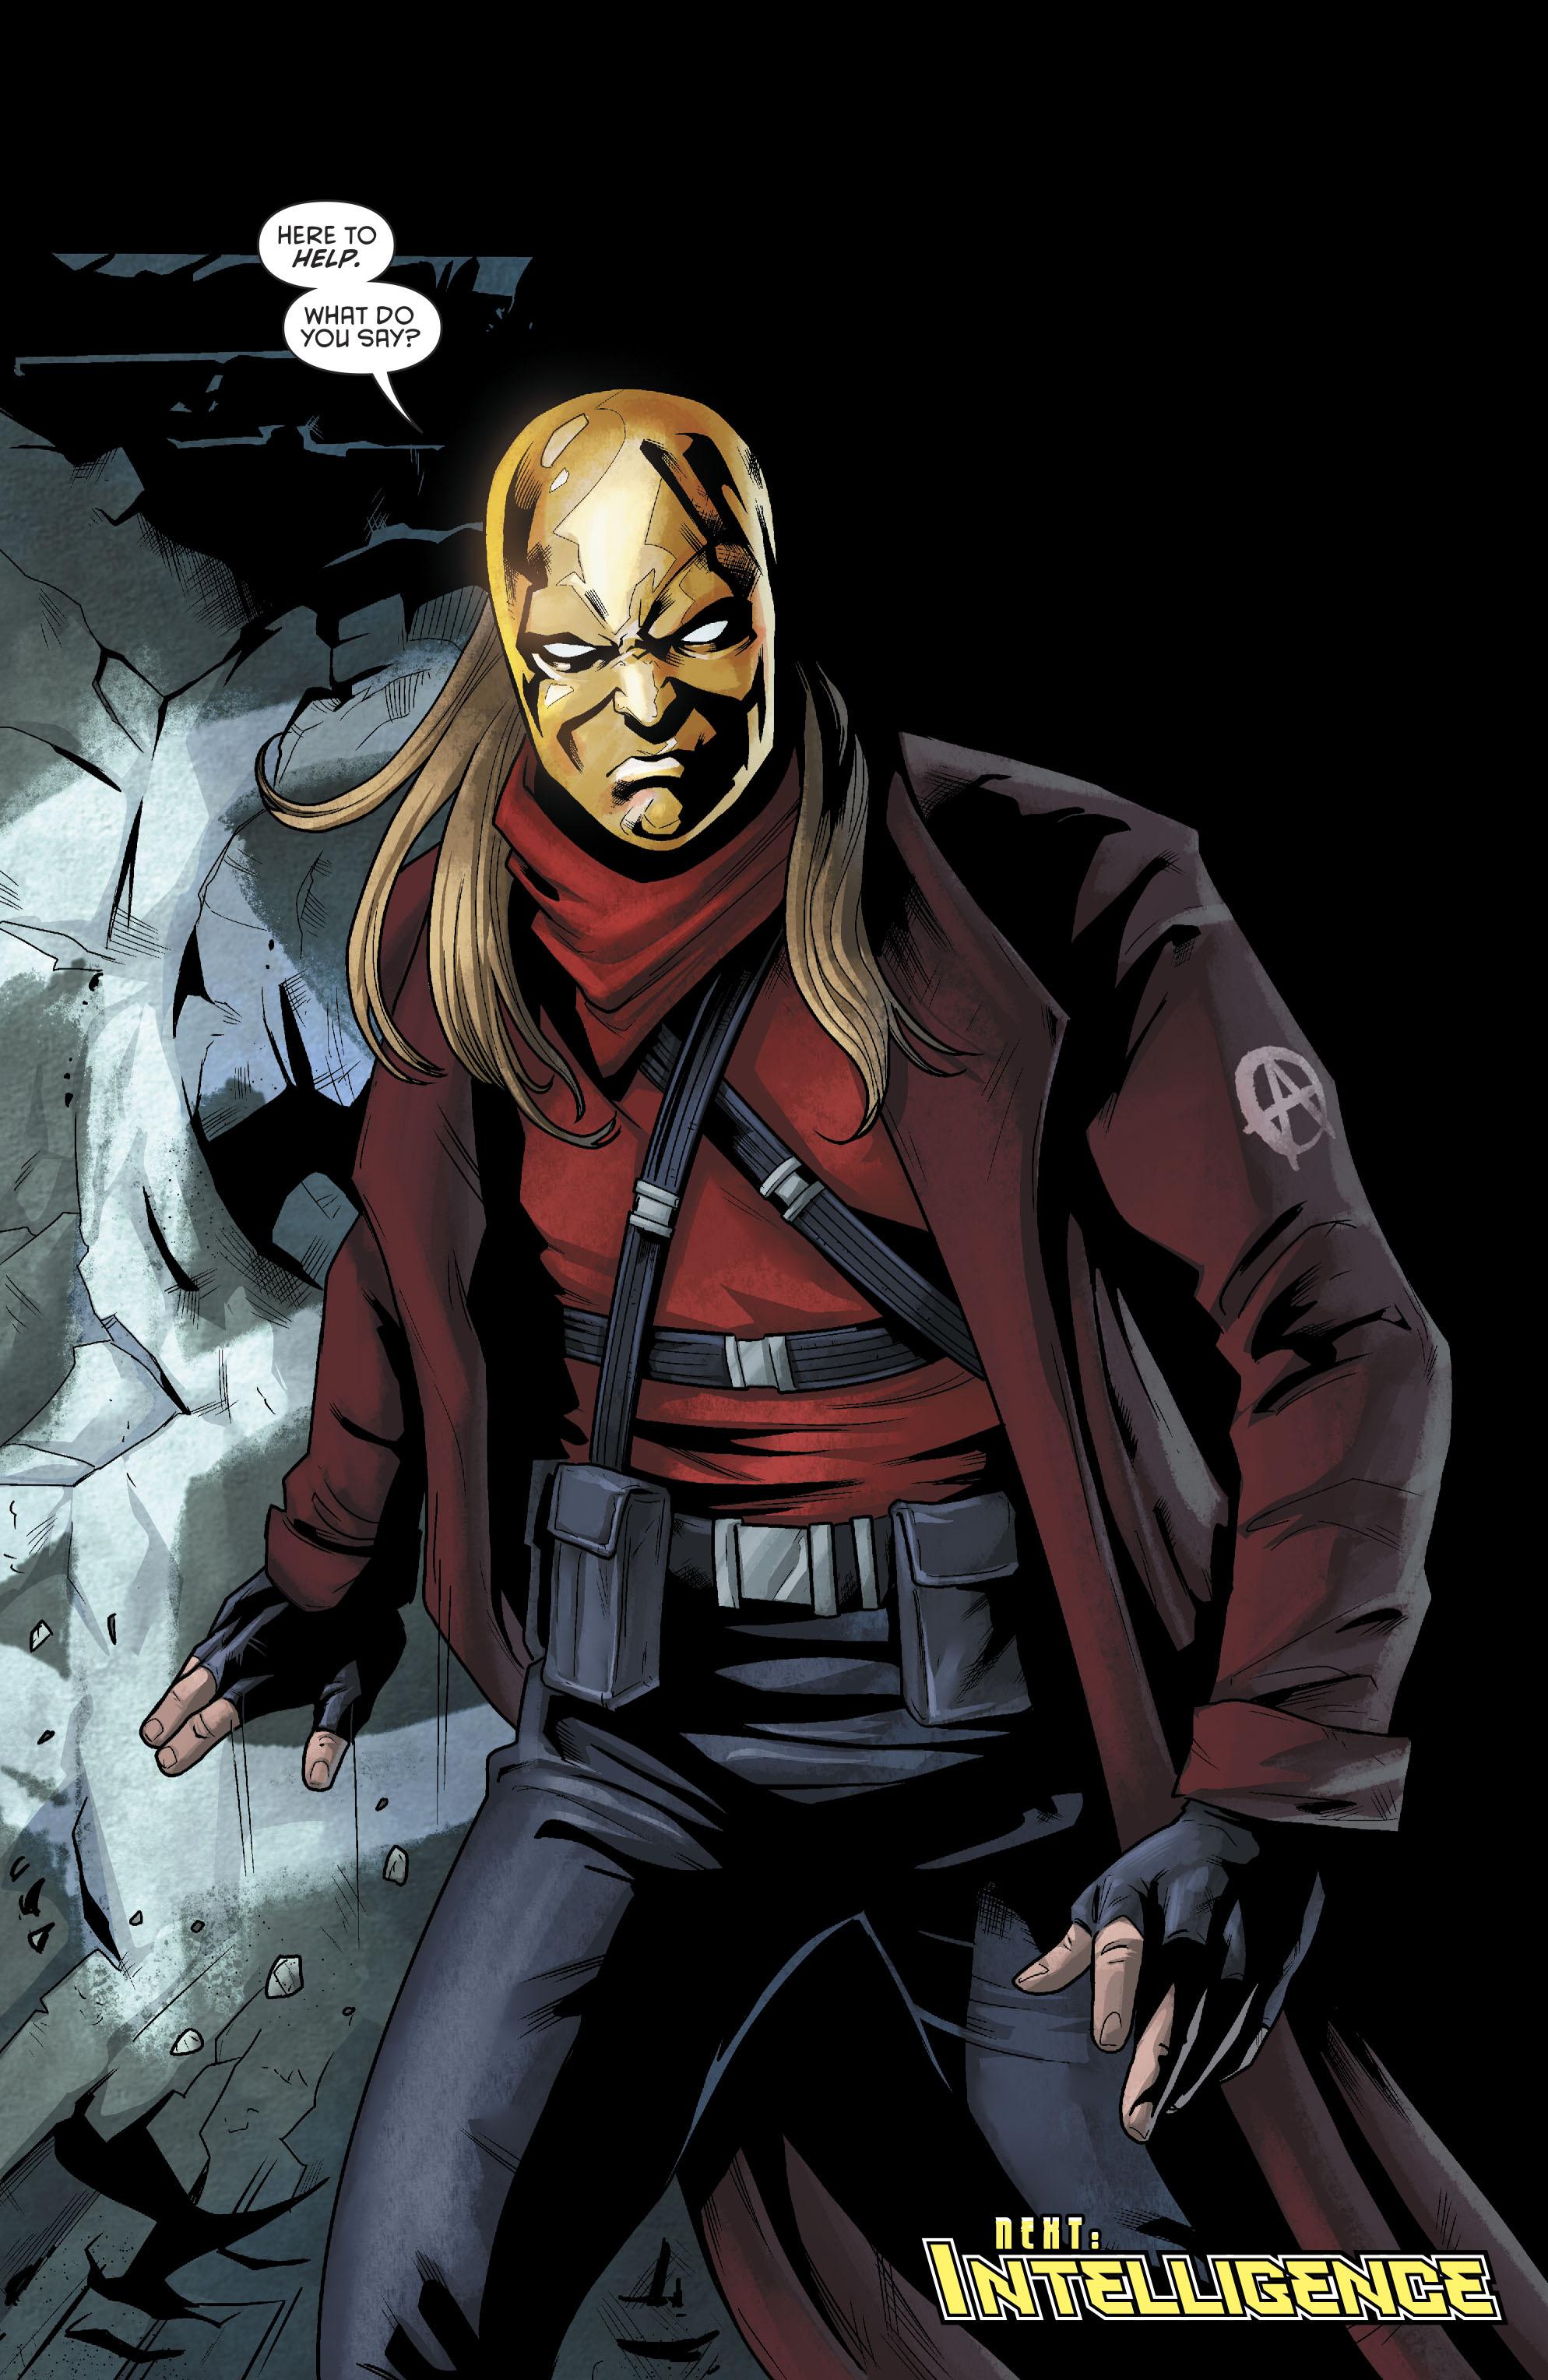 Read online Detective Comics (2016) comic -  Issue #957 - 22